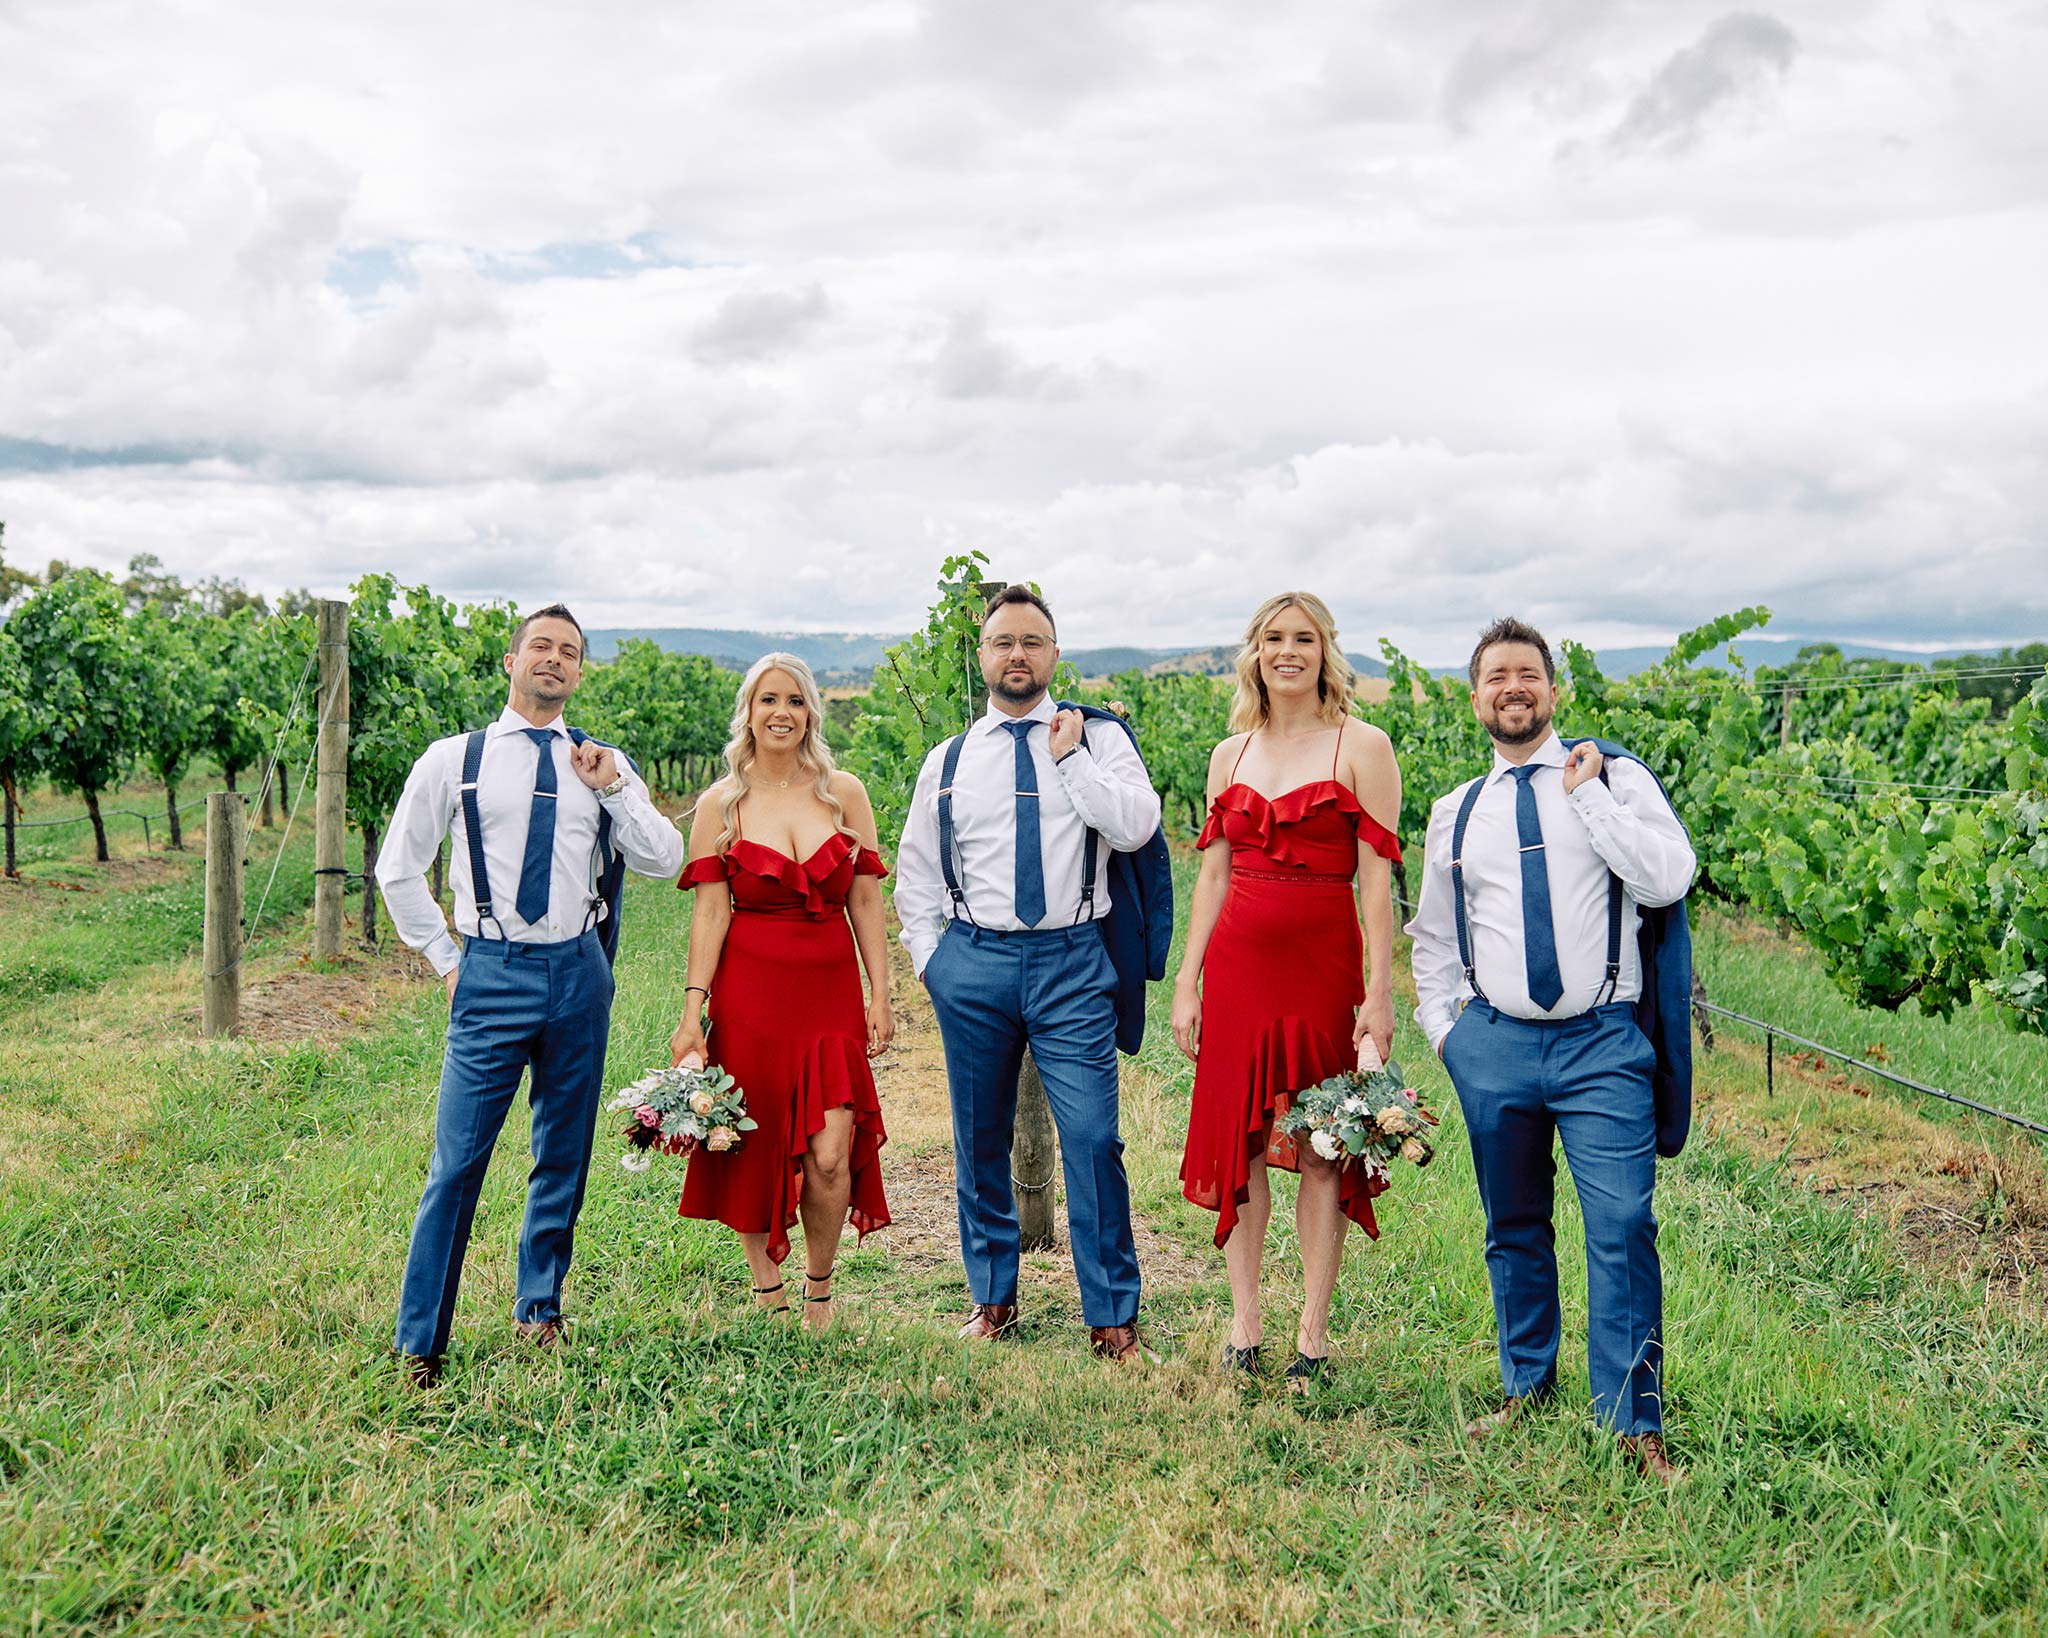 Zonzo estate wedding bridal party portrait vineyard